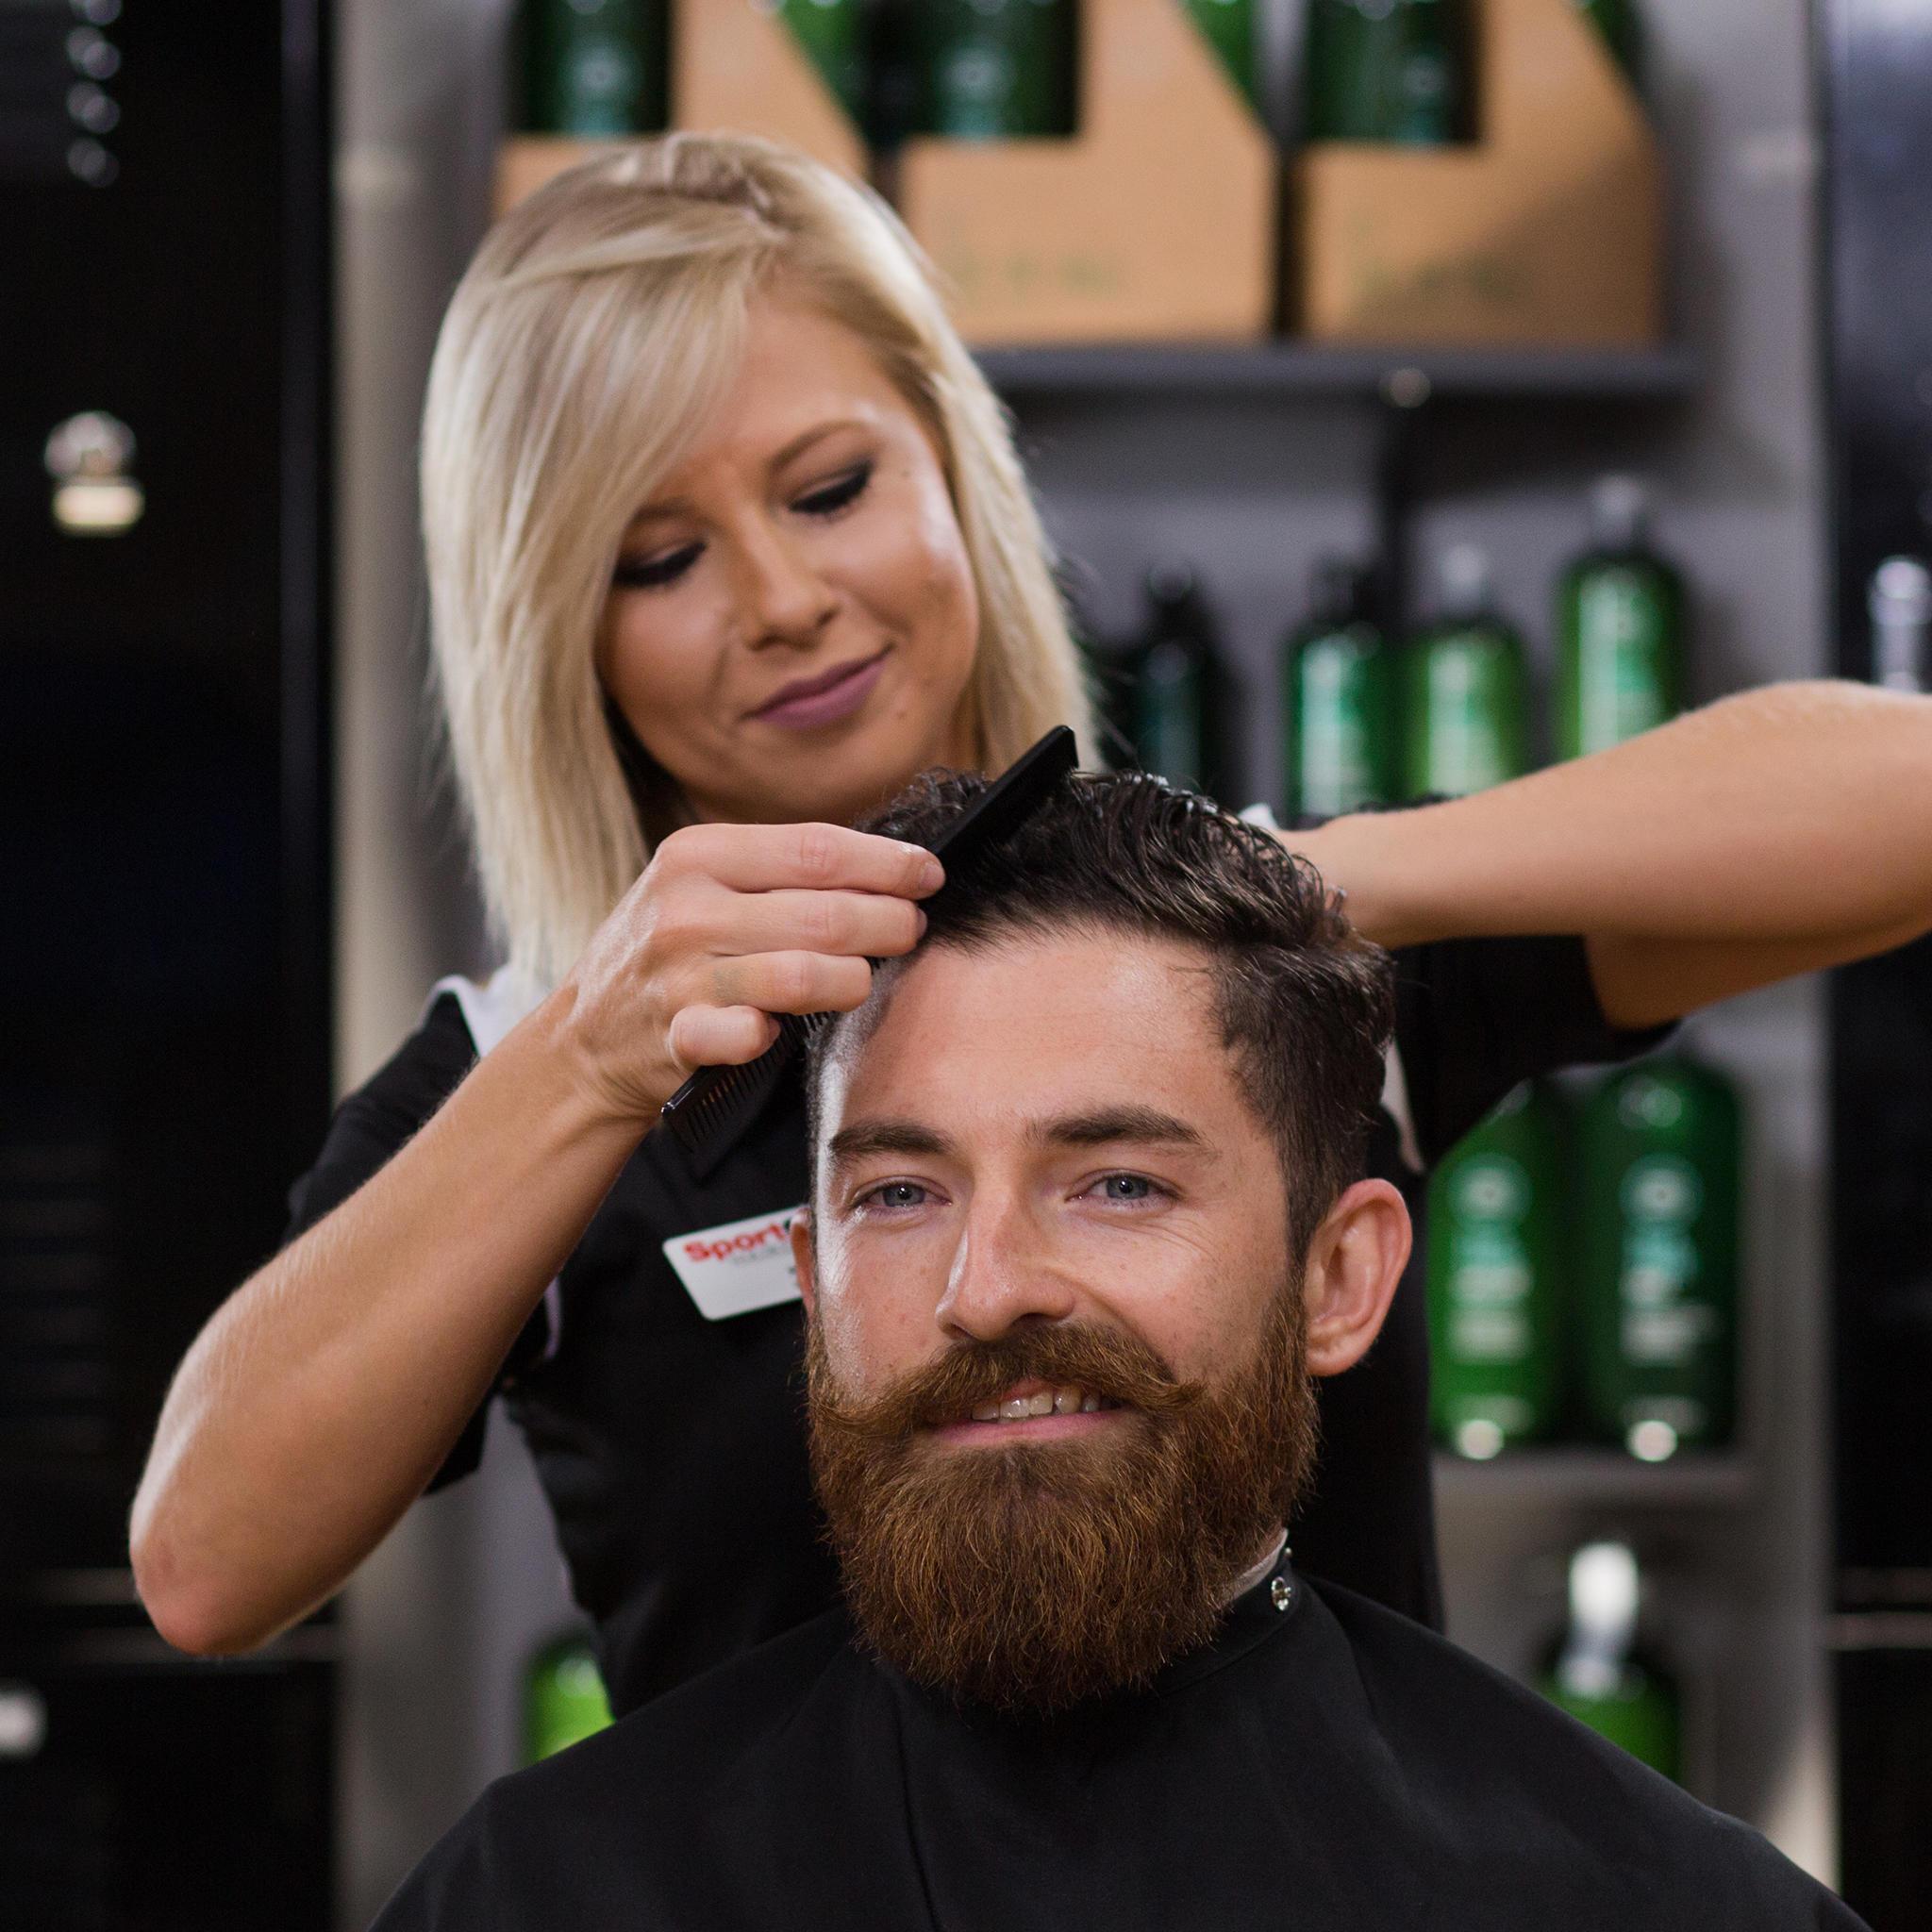 Sport Clips Haircuts of Surprise Hair Salon Surprise Arizona